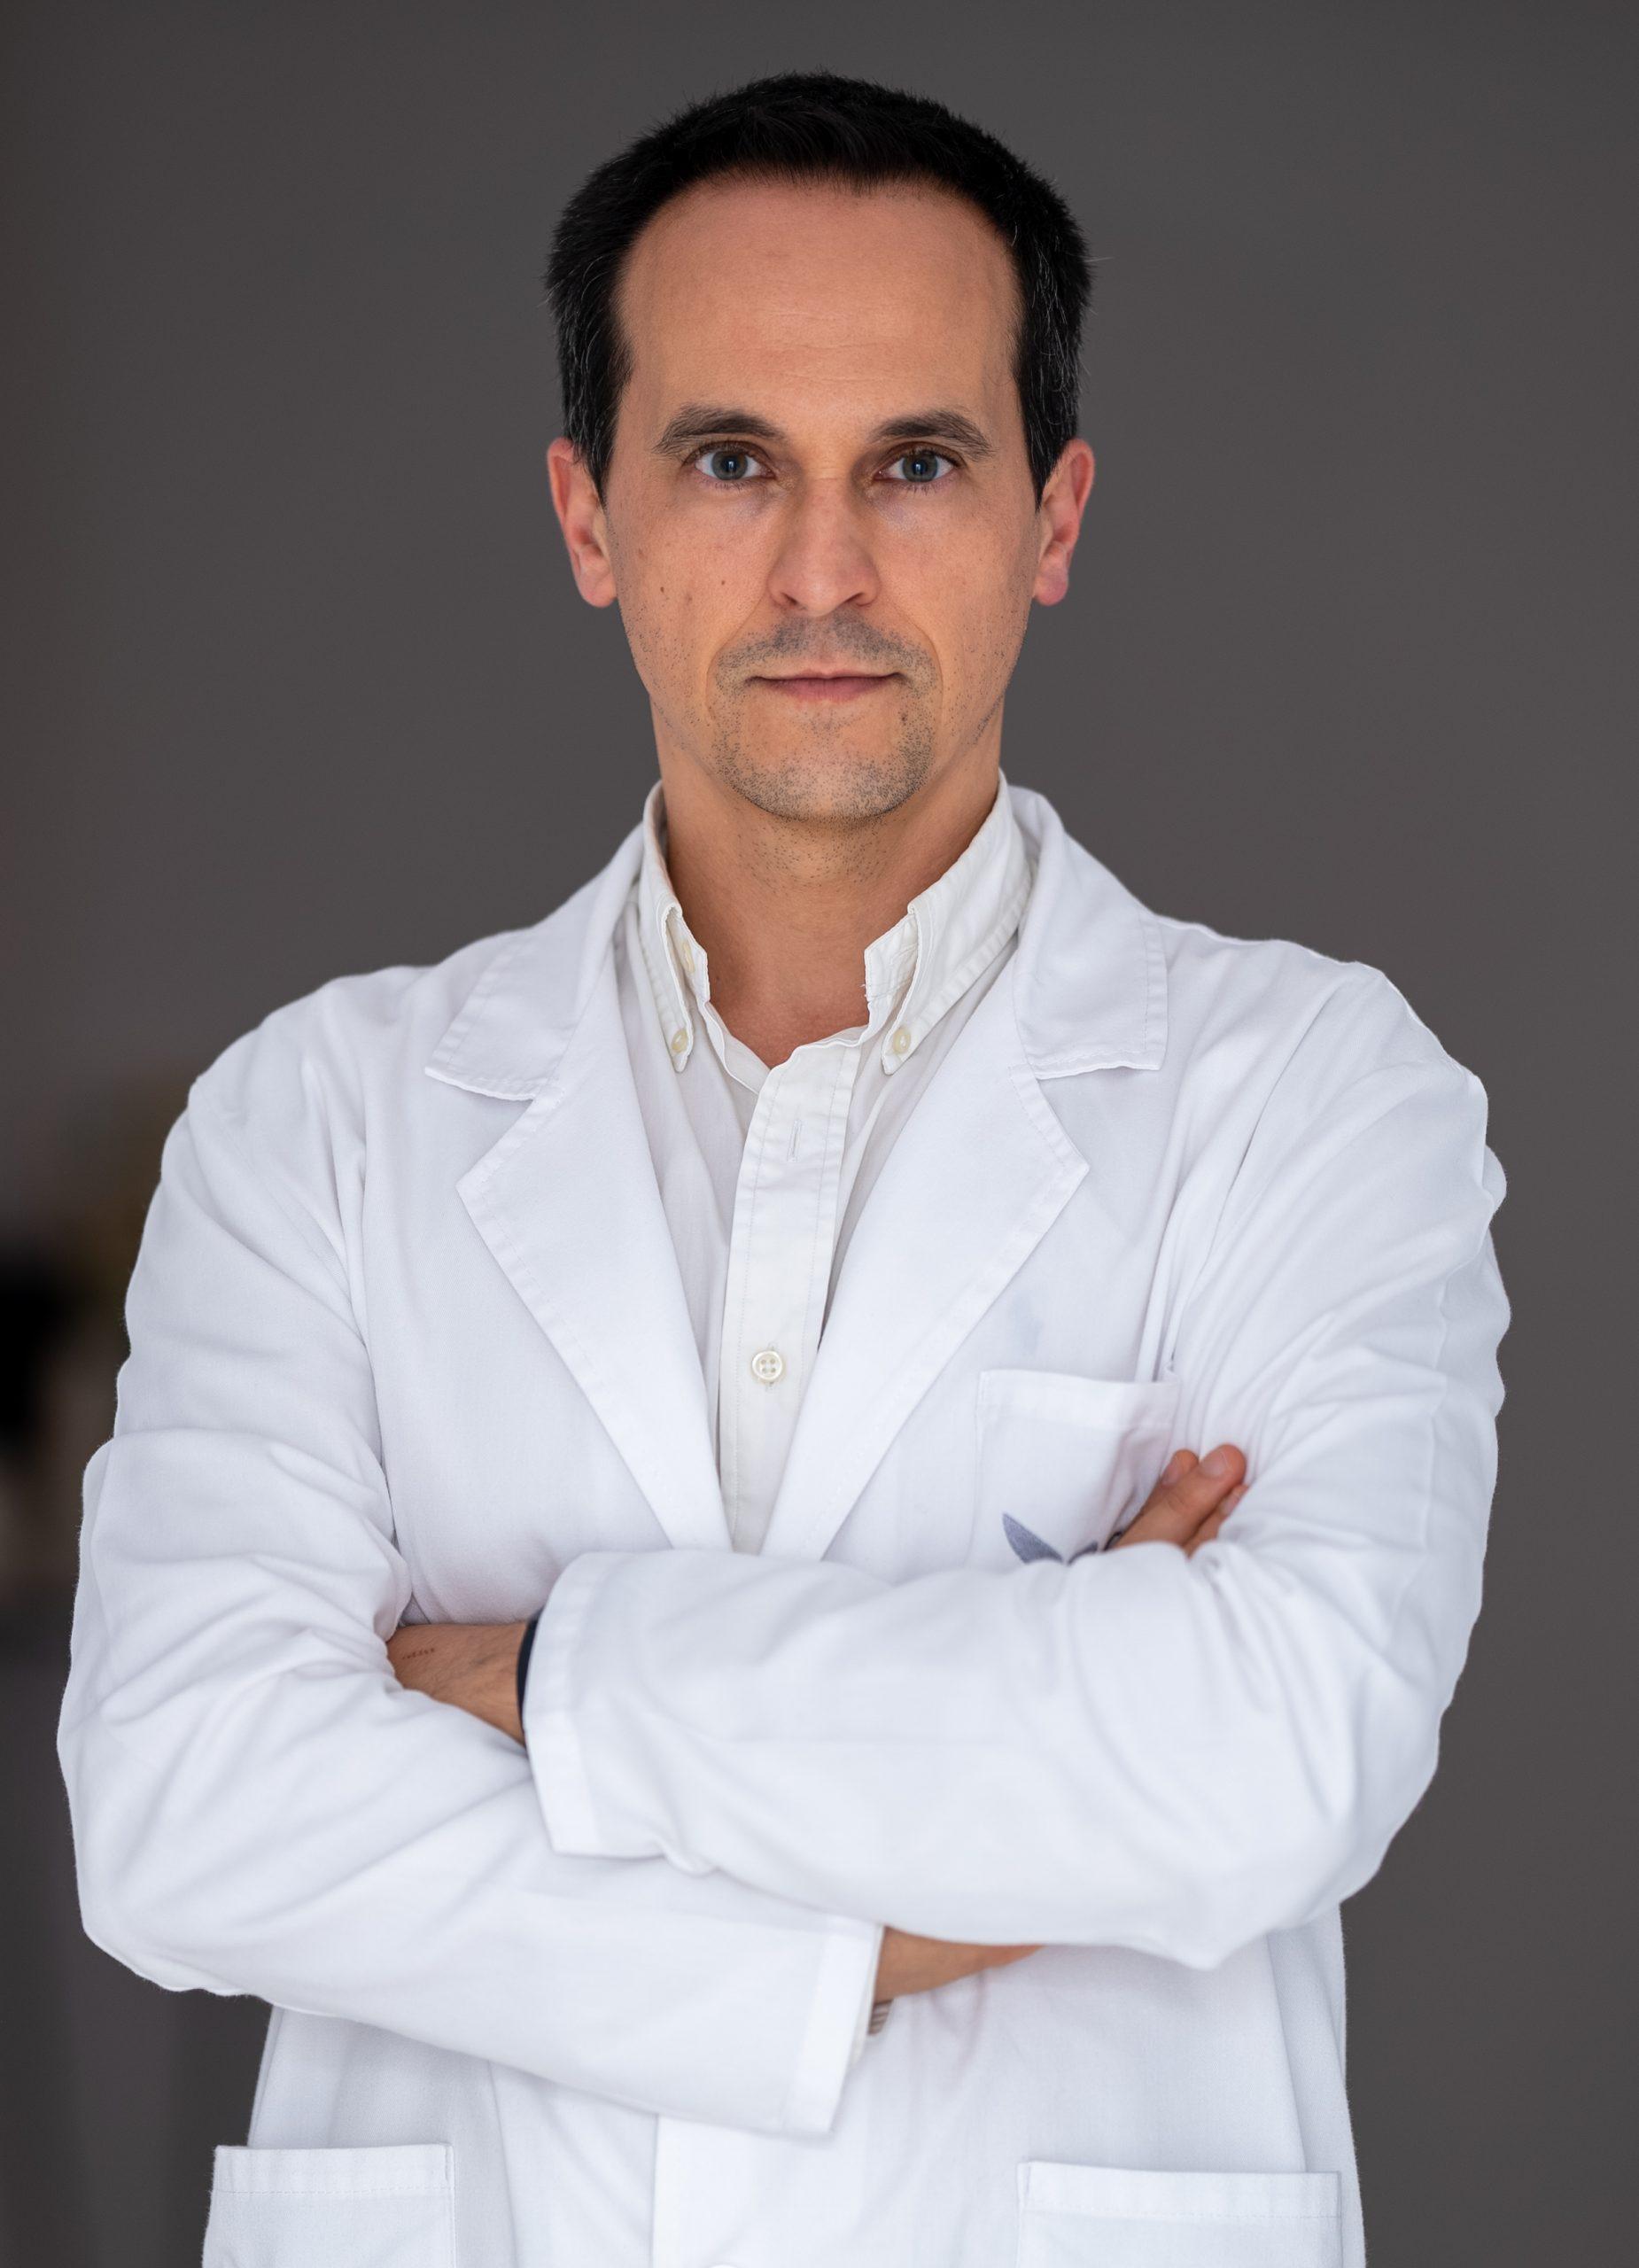 Dr. Marco Guerra Rocha